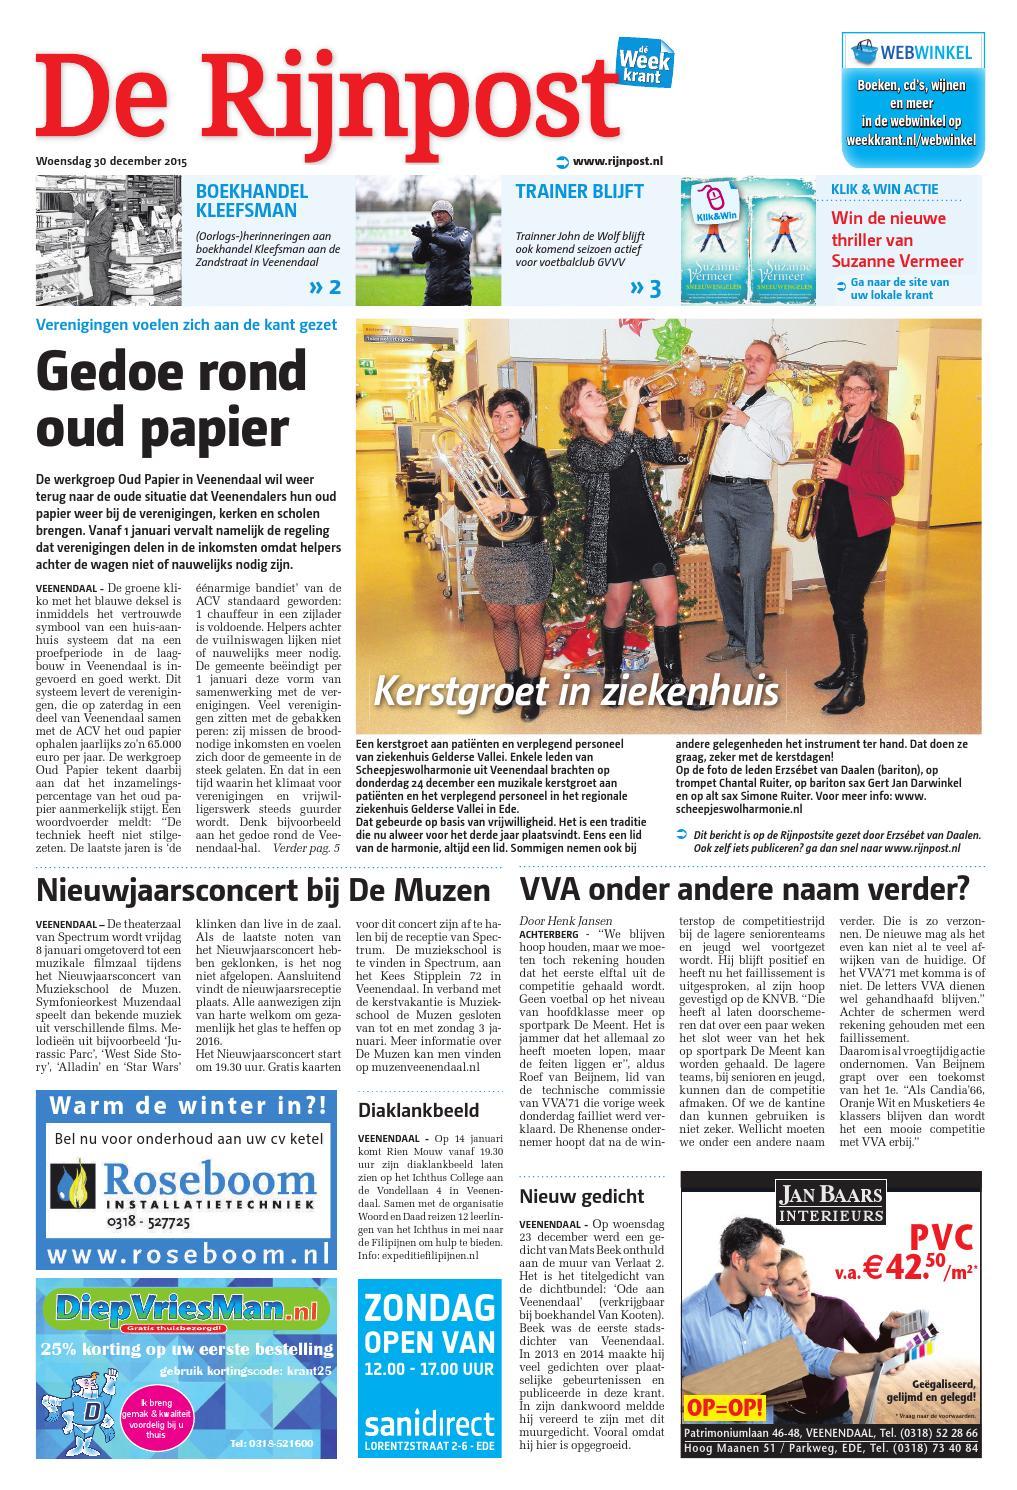 de rijnpost week53 by wegener issuu